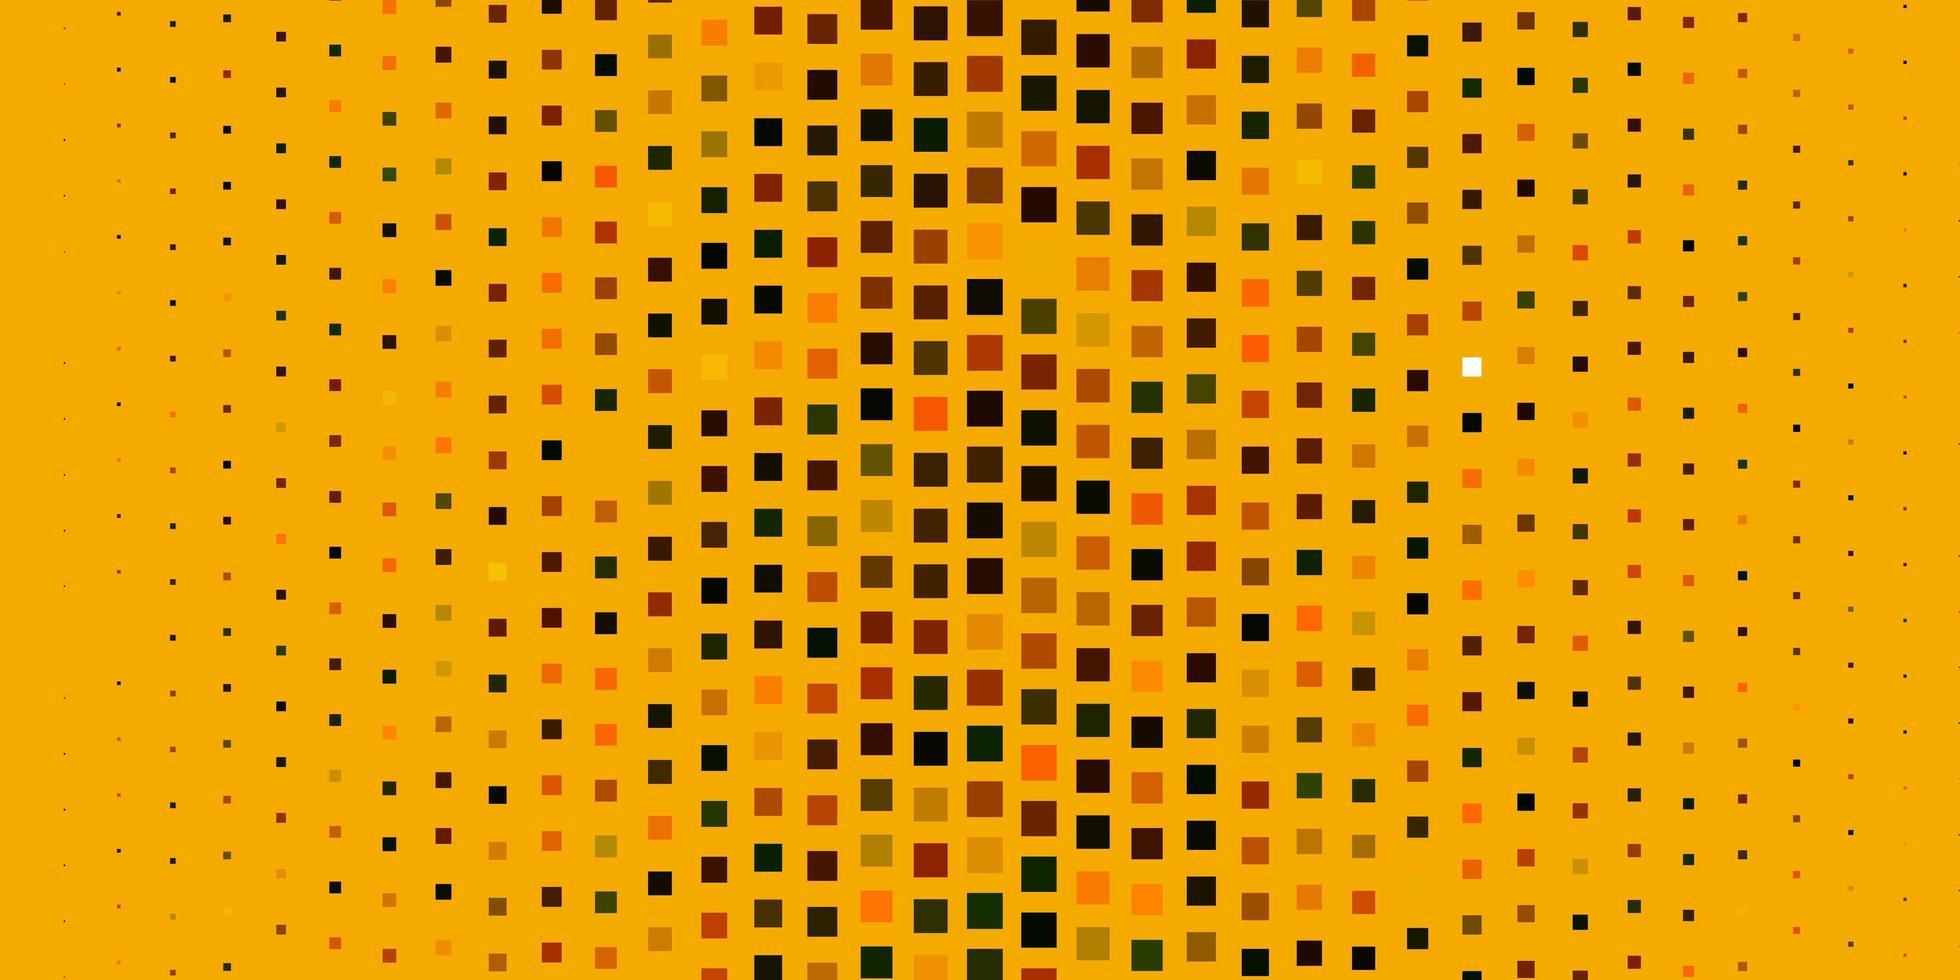 dunkelgrüner, gelber Vektorhintergrund im polygonalen Stil. vektor